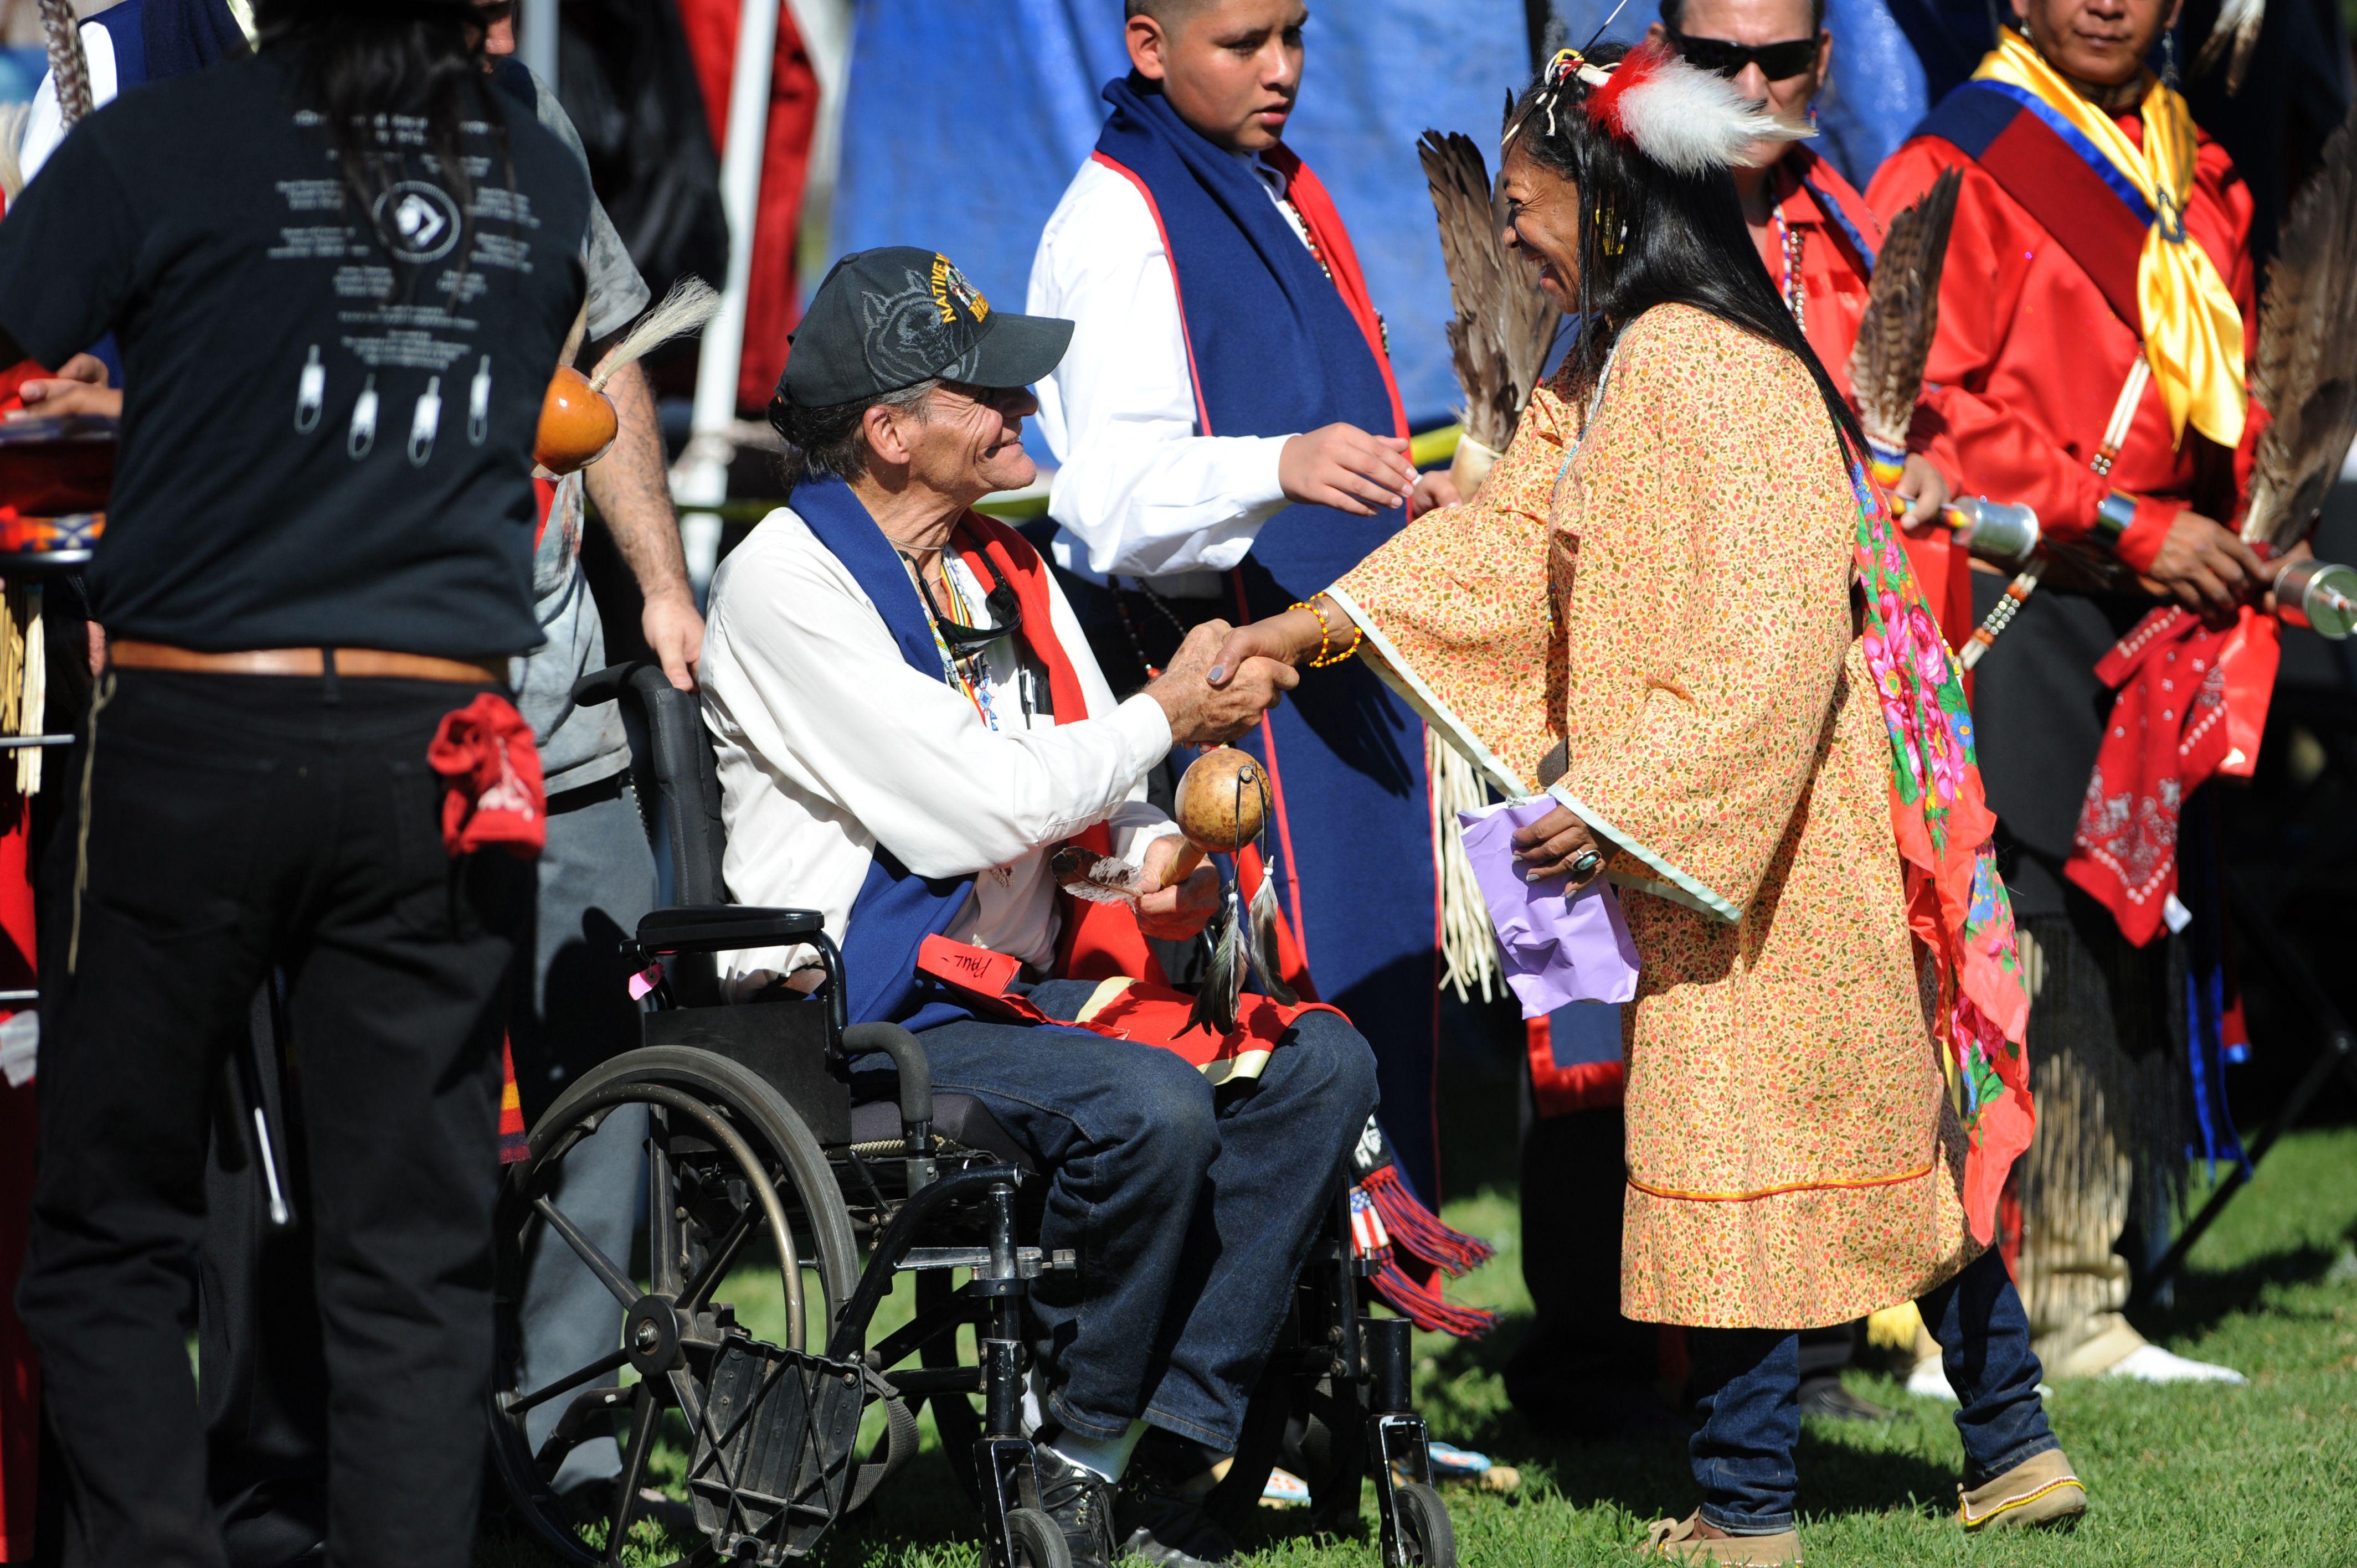 Tribe member greets Navy World War II veteran Paul Duronslet, a Cherokee tribesman from Los Angeles, Calif., during the gourd dancing festivities at Native American Veterans Association's Annual Veterans Appreciation